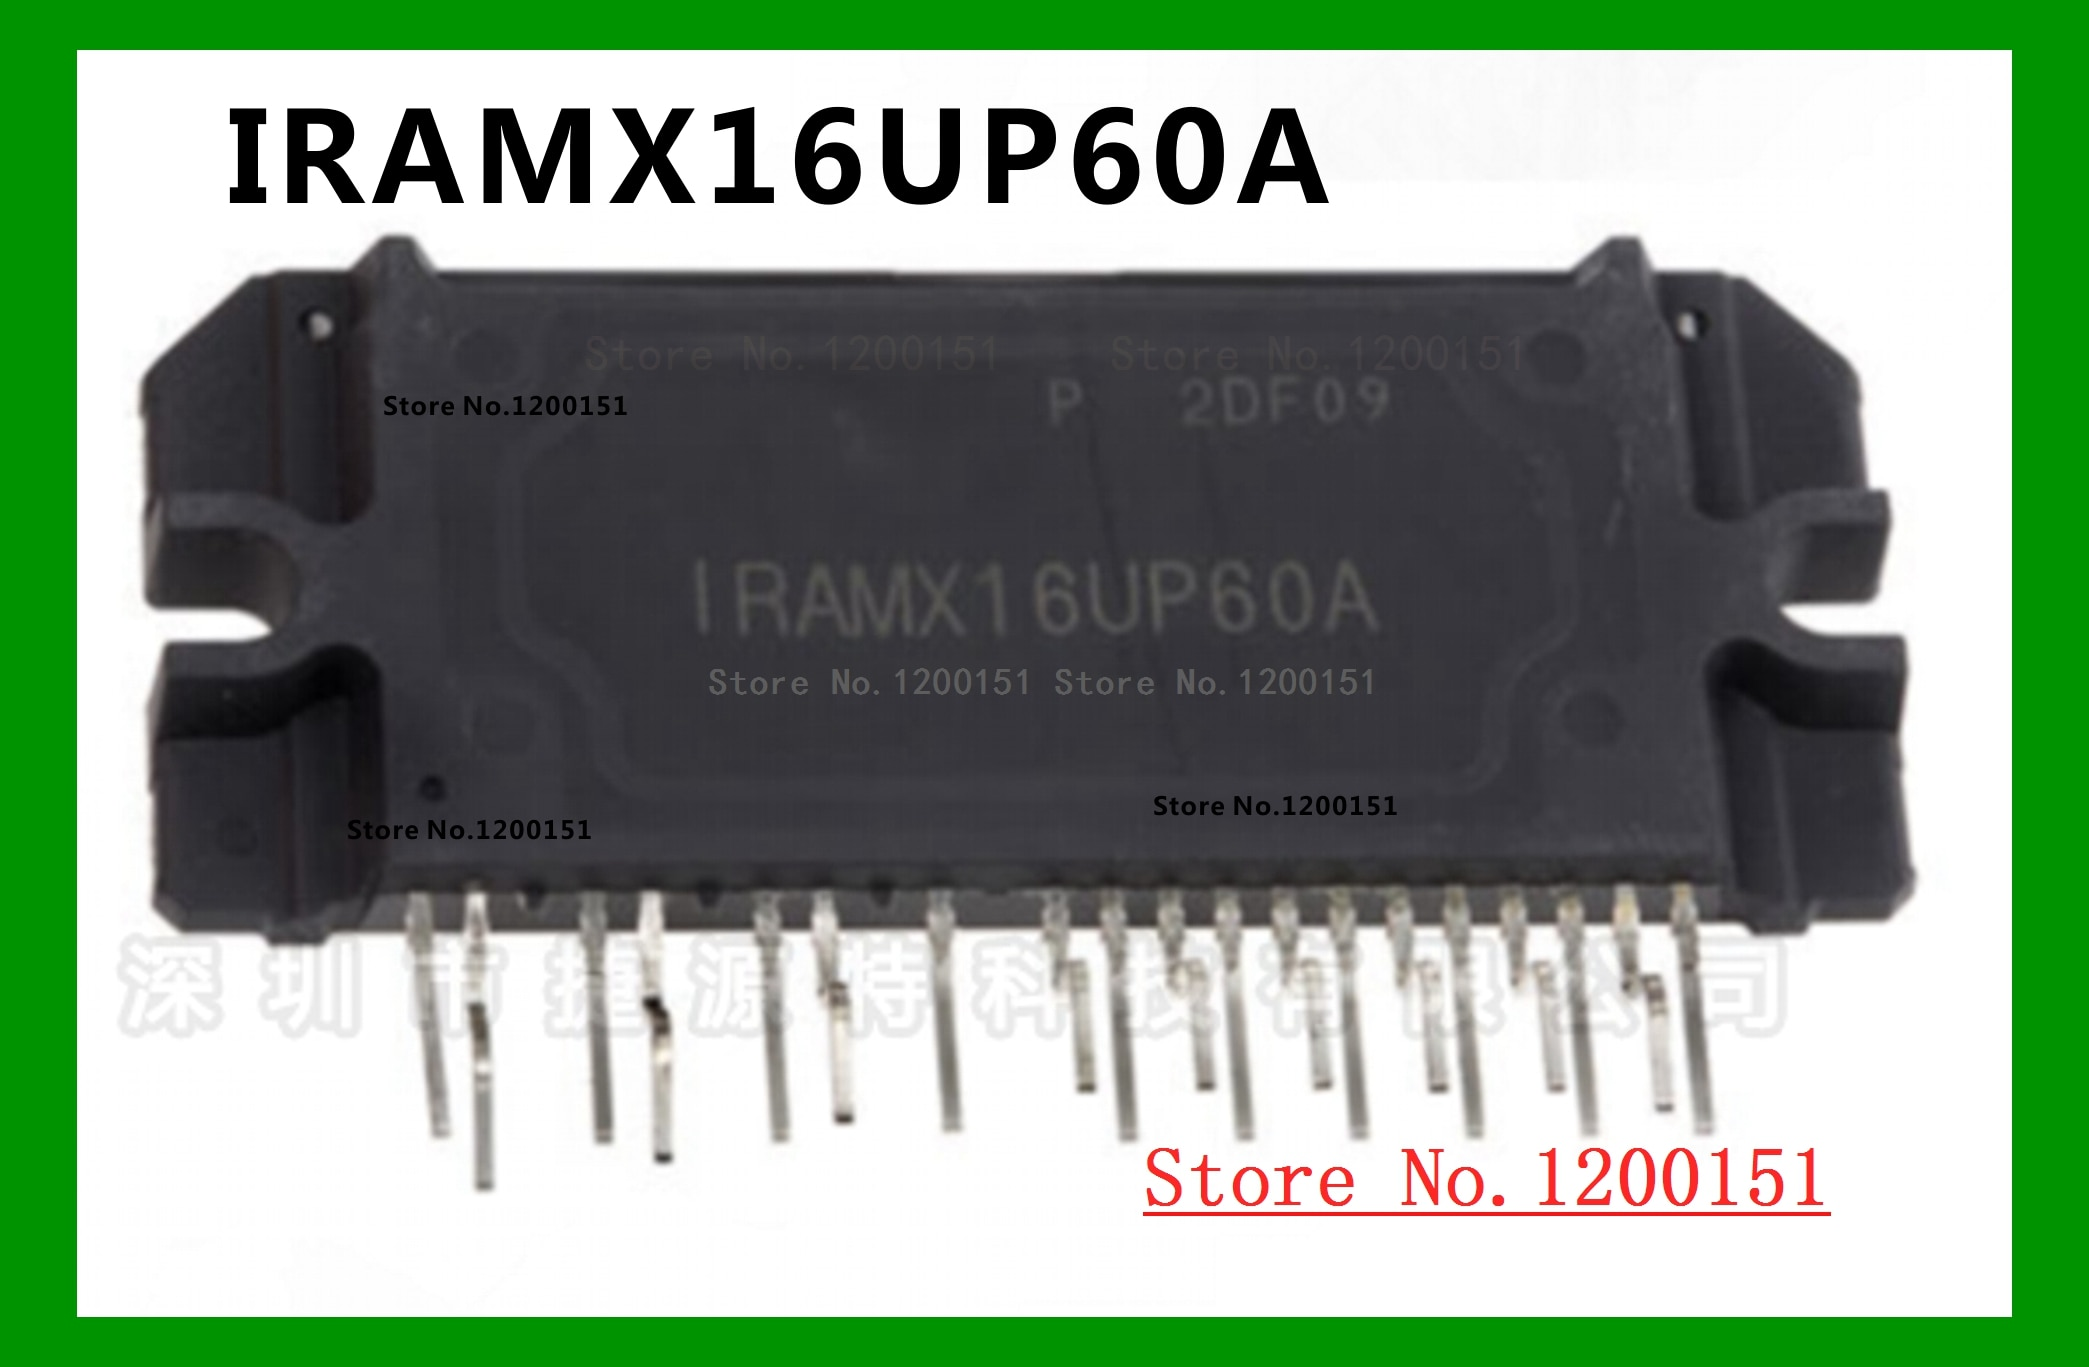 IRAMX16UP60A IRAMX16UP60A-2 IRAMX16UP60B IRAMX16UP60B-2 модули